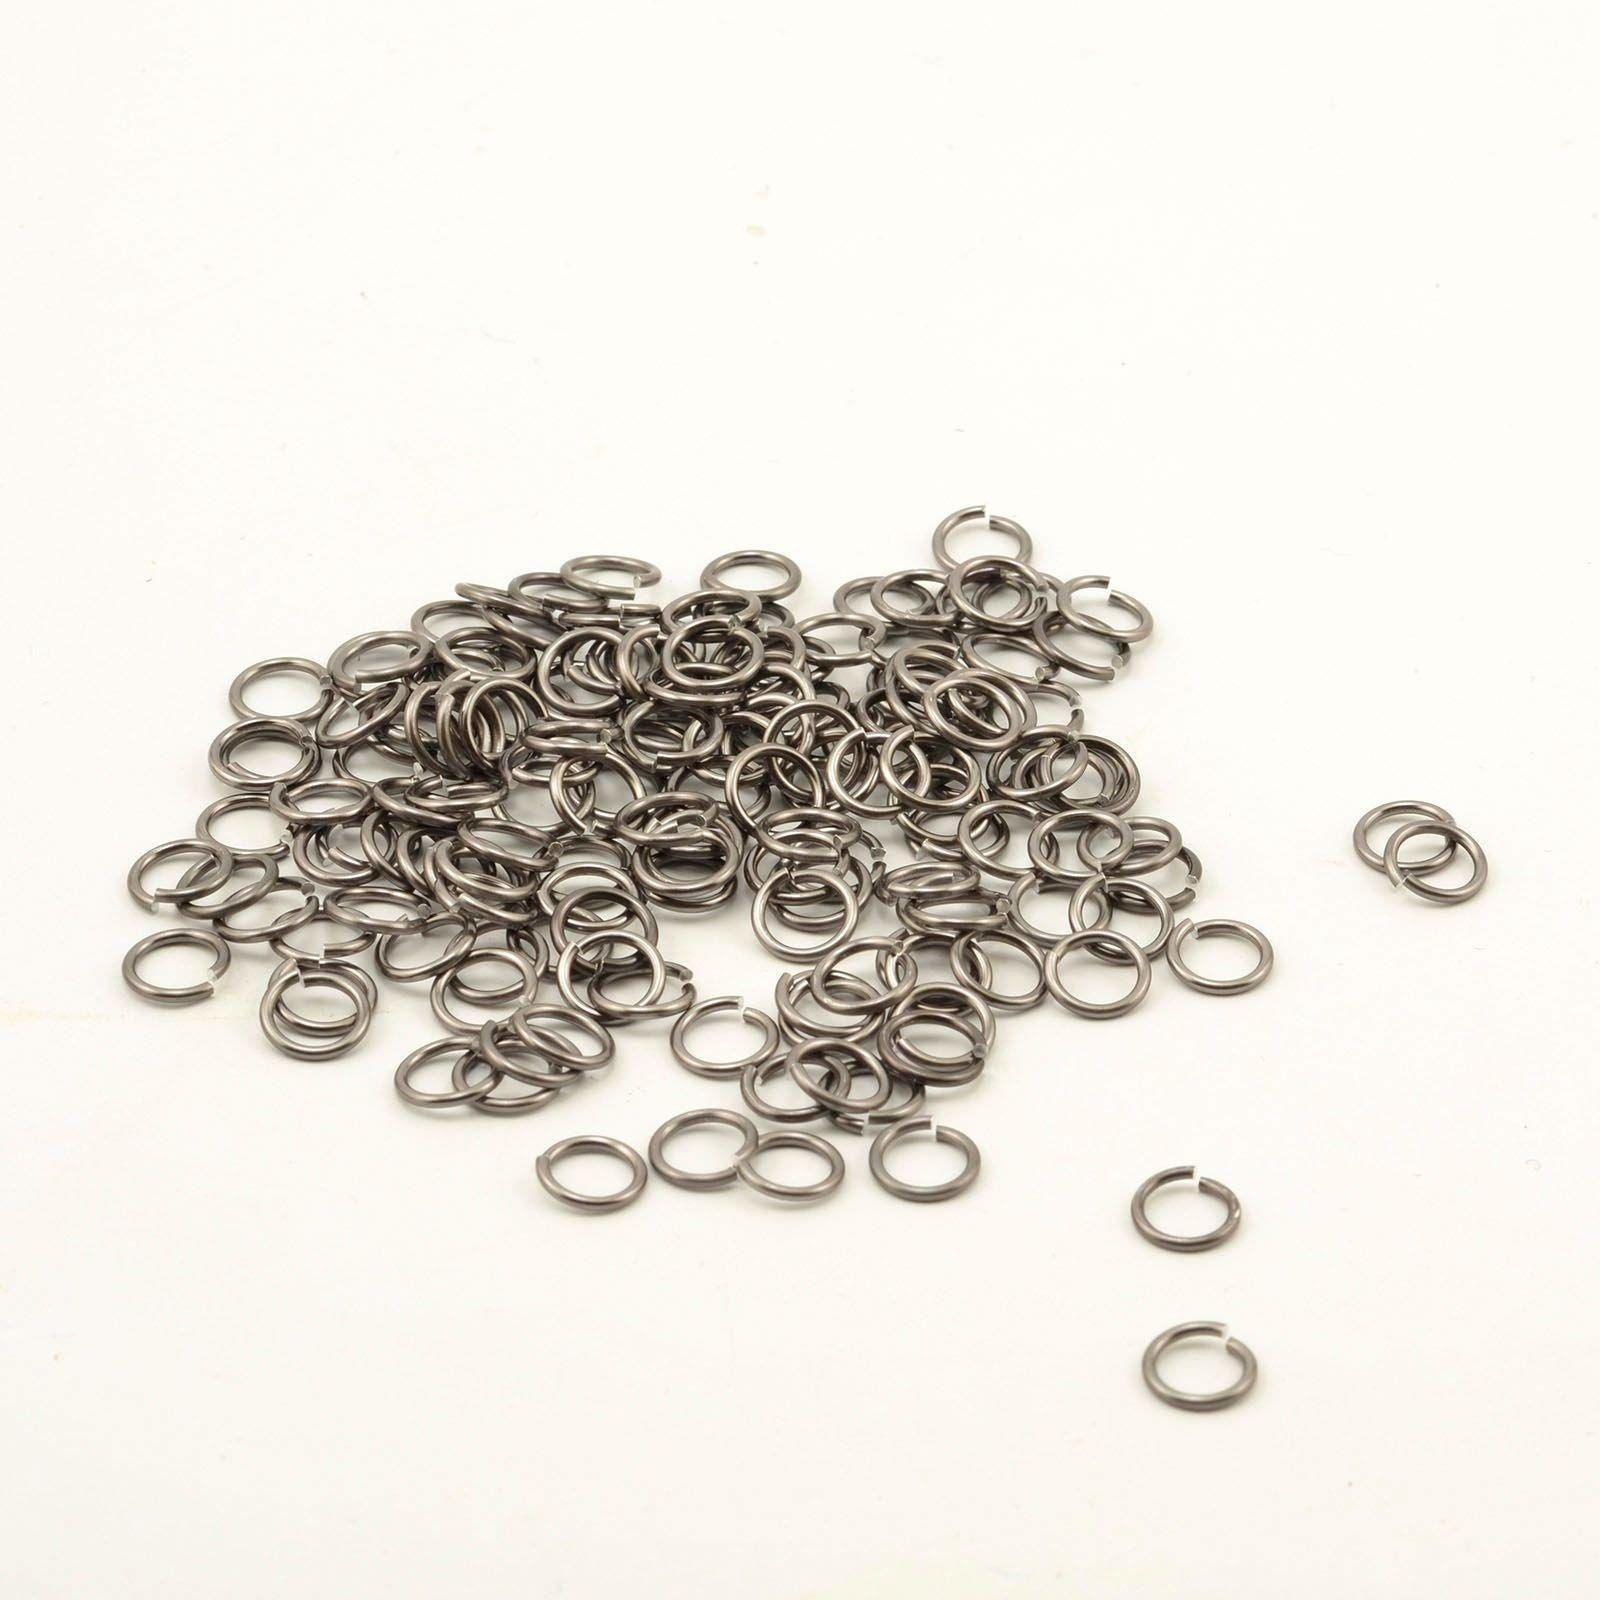 Vaessen Creative Alu Deco zginane pierścienie 7,25 mm szare 150 sztuk, aluminium, antracyt, 0, 72 x 0,2 cm, 150 sztuk